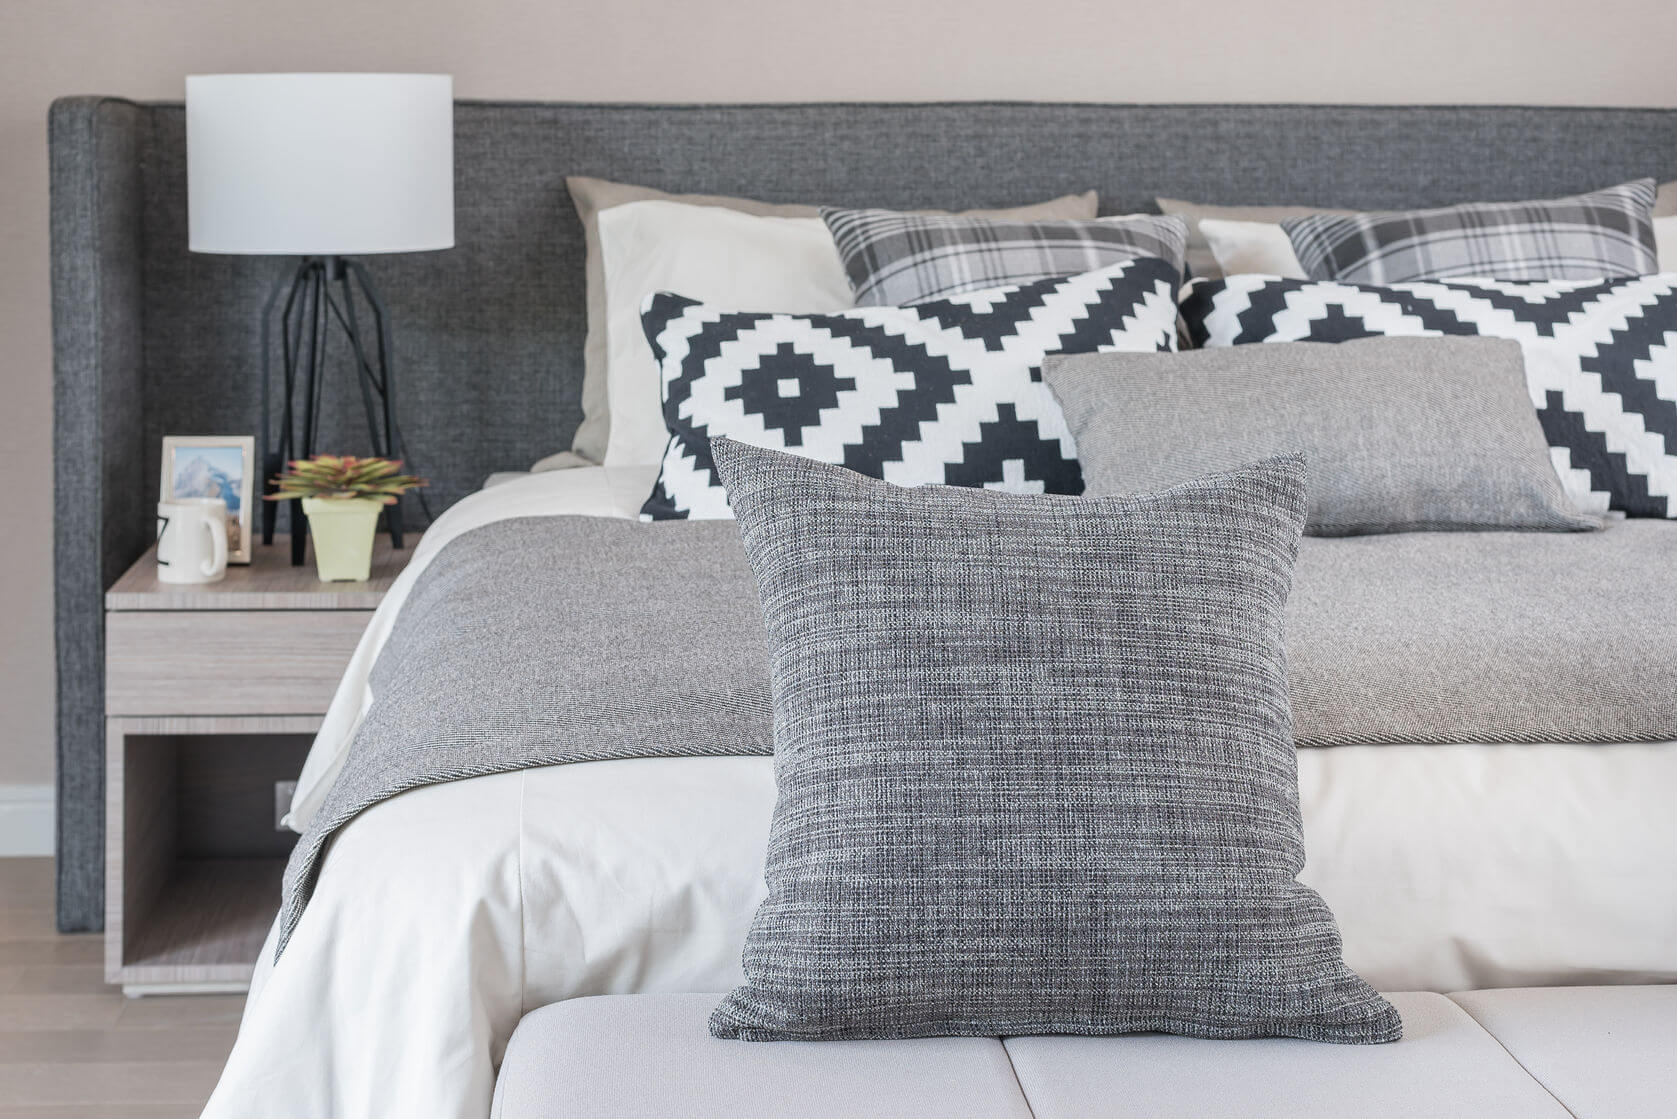 schlafsofas l ngsschl fer und querschl fer sleeping art. Black Bedroom Furniture Sets. Home Design Ideas